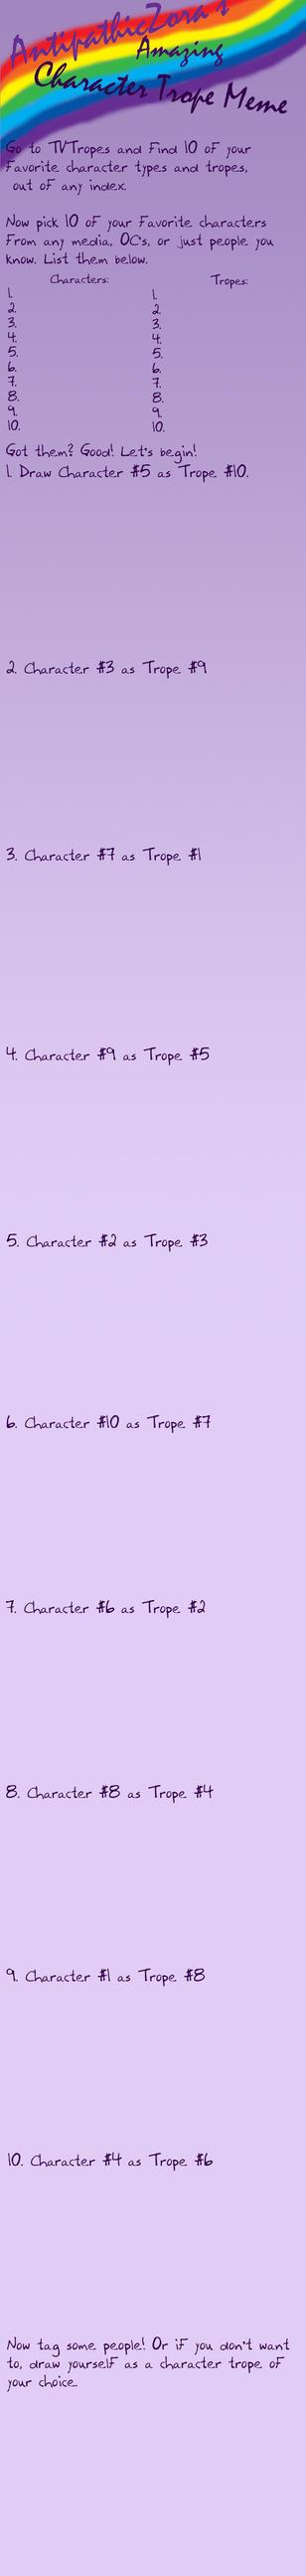 Character Trope Meme -Blank- by AntipathicZora